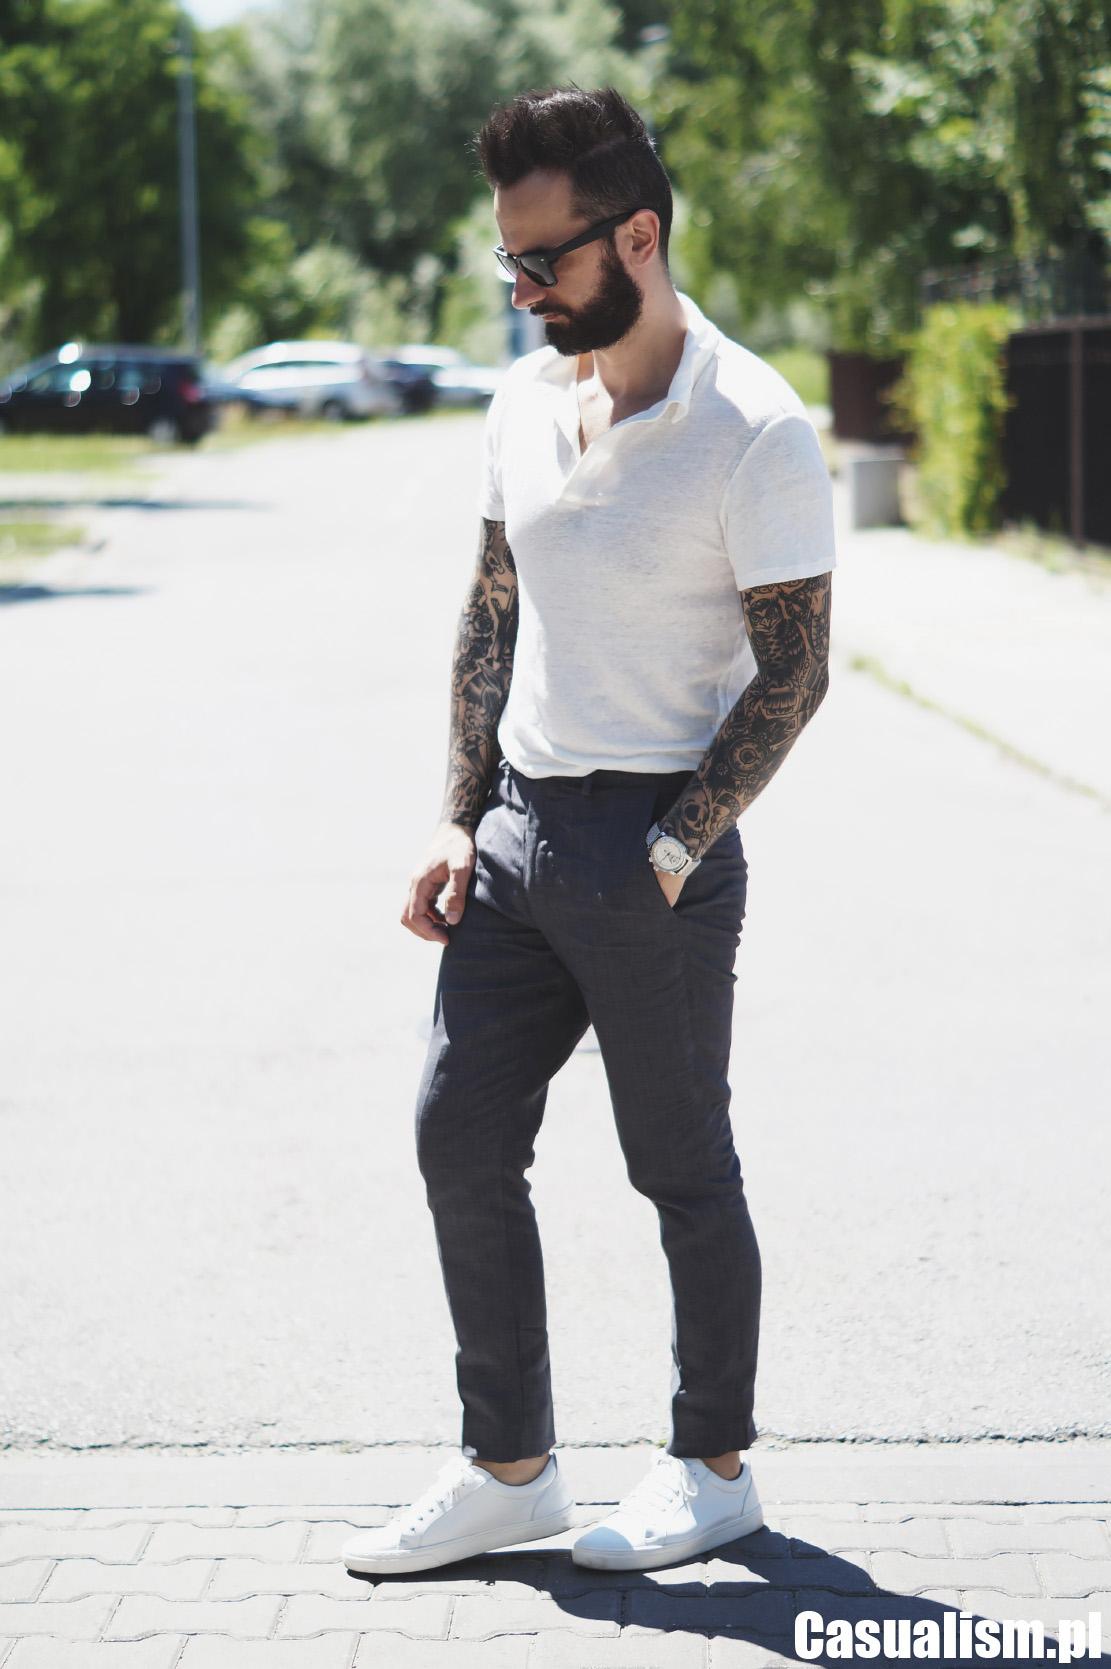 Koszulka polo męska, męska polówka, polówka męska koszulka, koszulka do spodni, koszulka w spodniach, jak nosić koszulkę w spodniach, zaportkować koszulkę, zakasać koszulkę do spodni, zestaw smart-casual